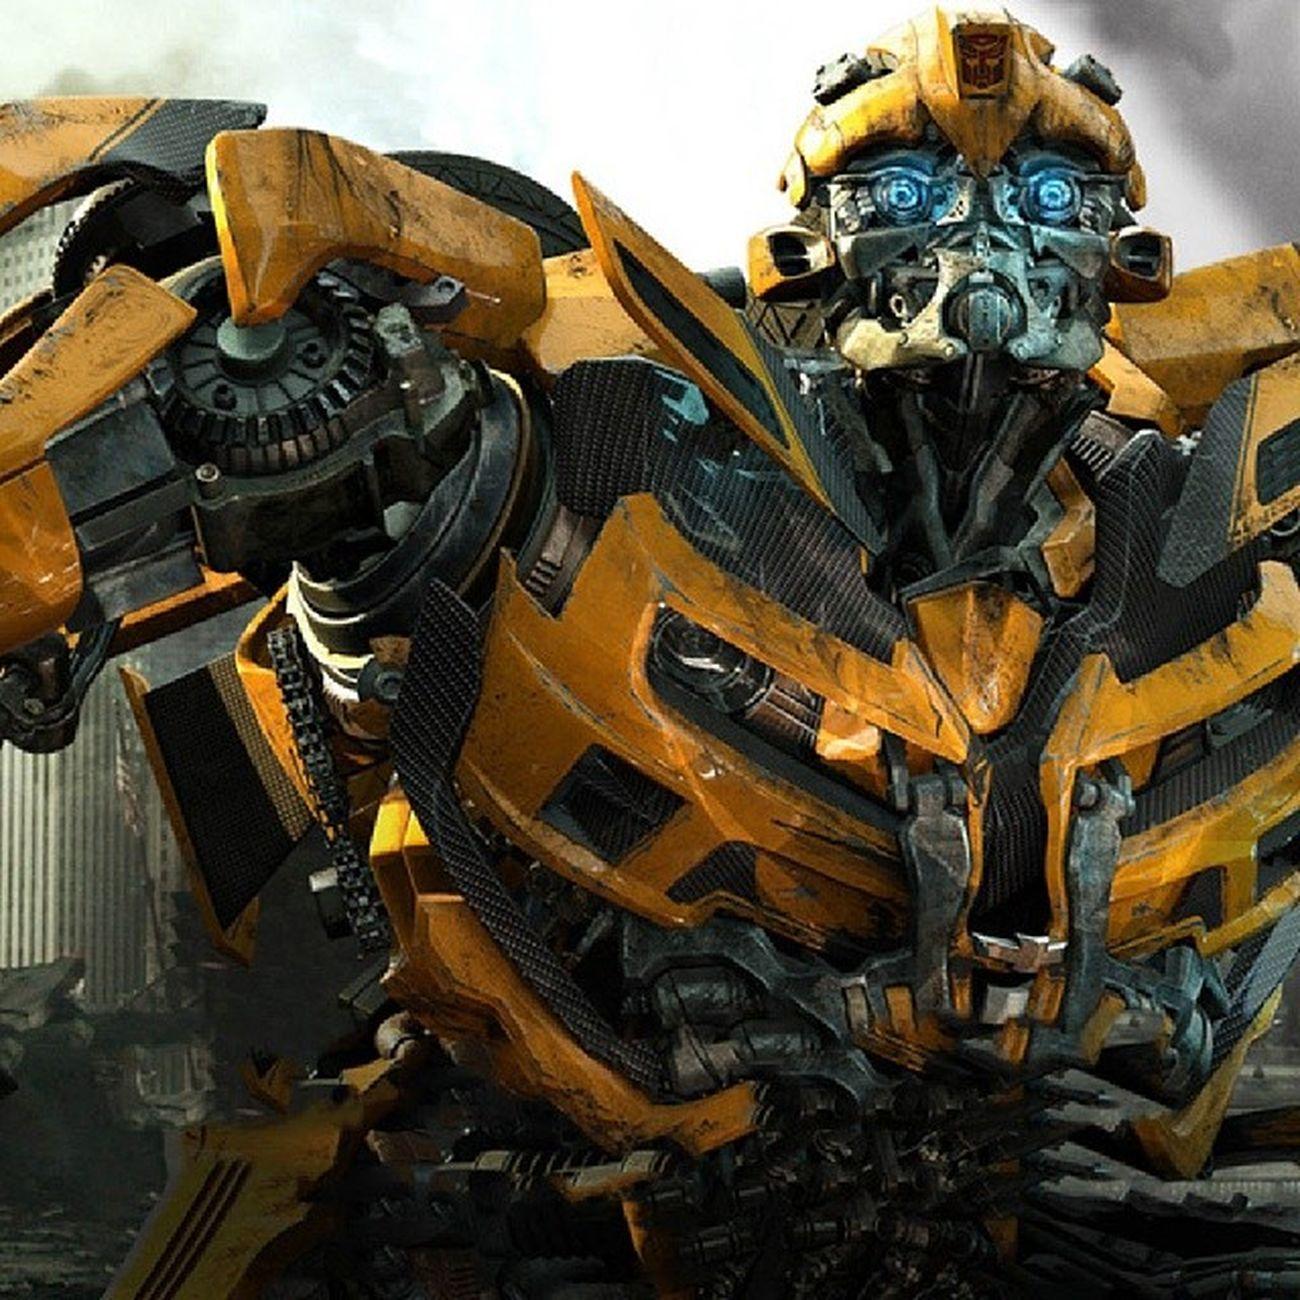 Детка <3 Transformer Bee Bumblebee Yellow like camaro chevrolet